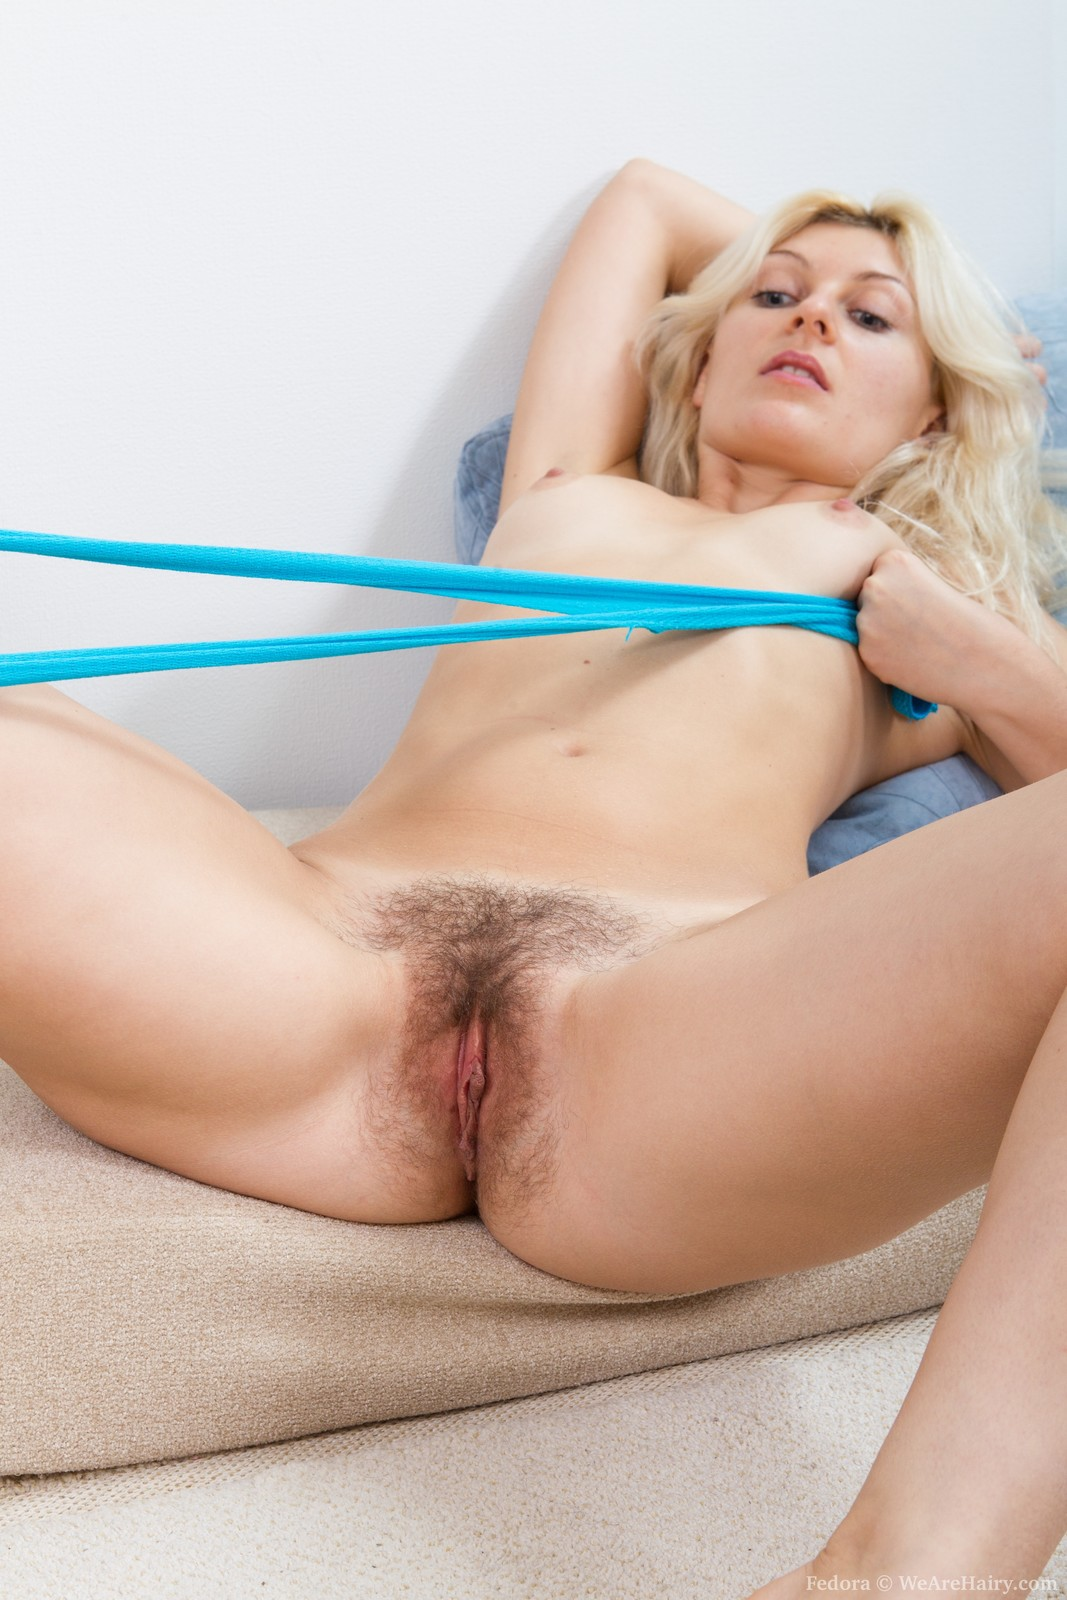 Rubber boy sex toy